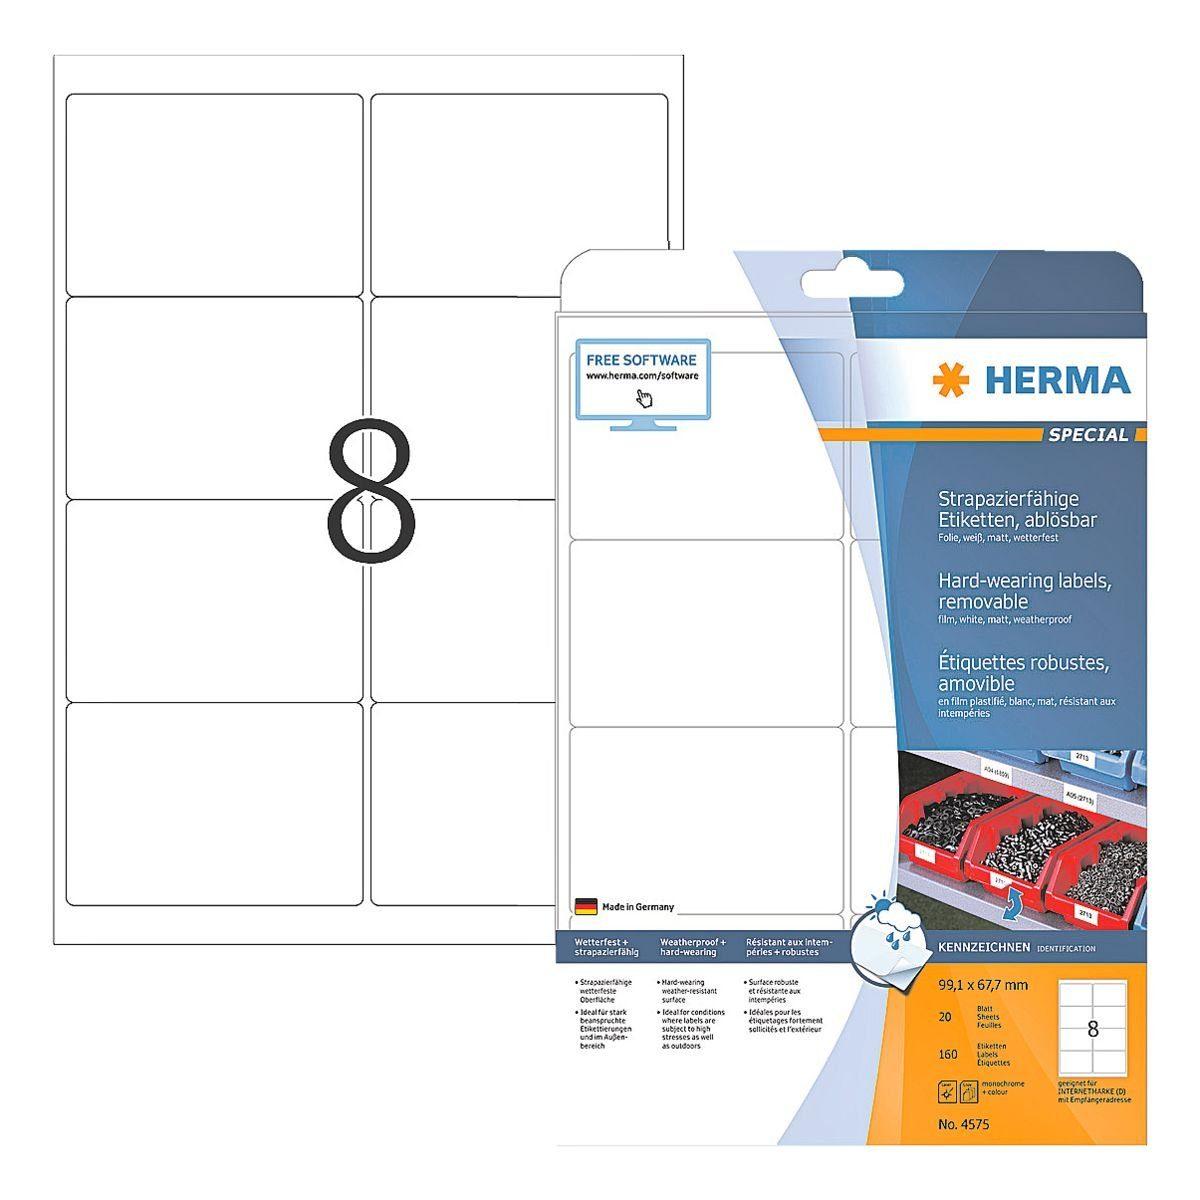 HERMA Outdoor Folien-Etiketten 160 Stück »Special«